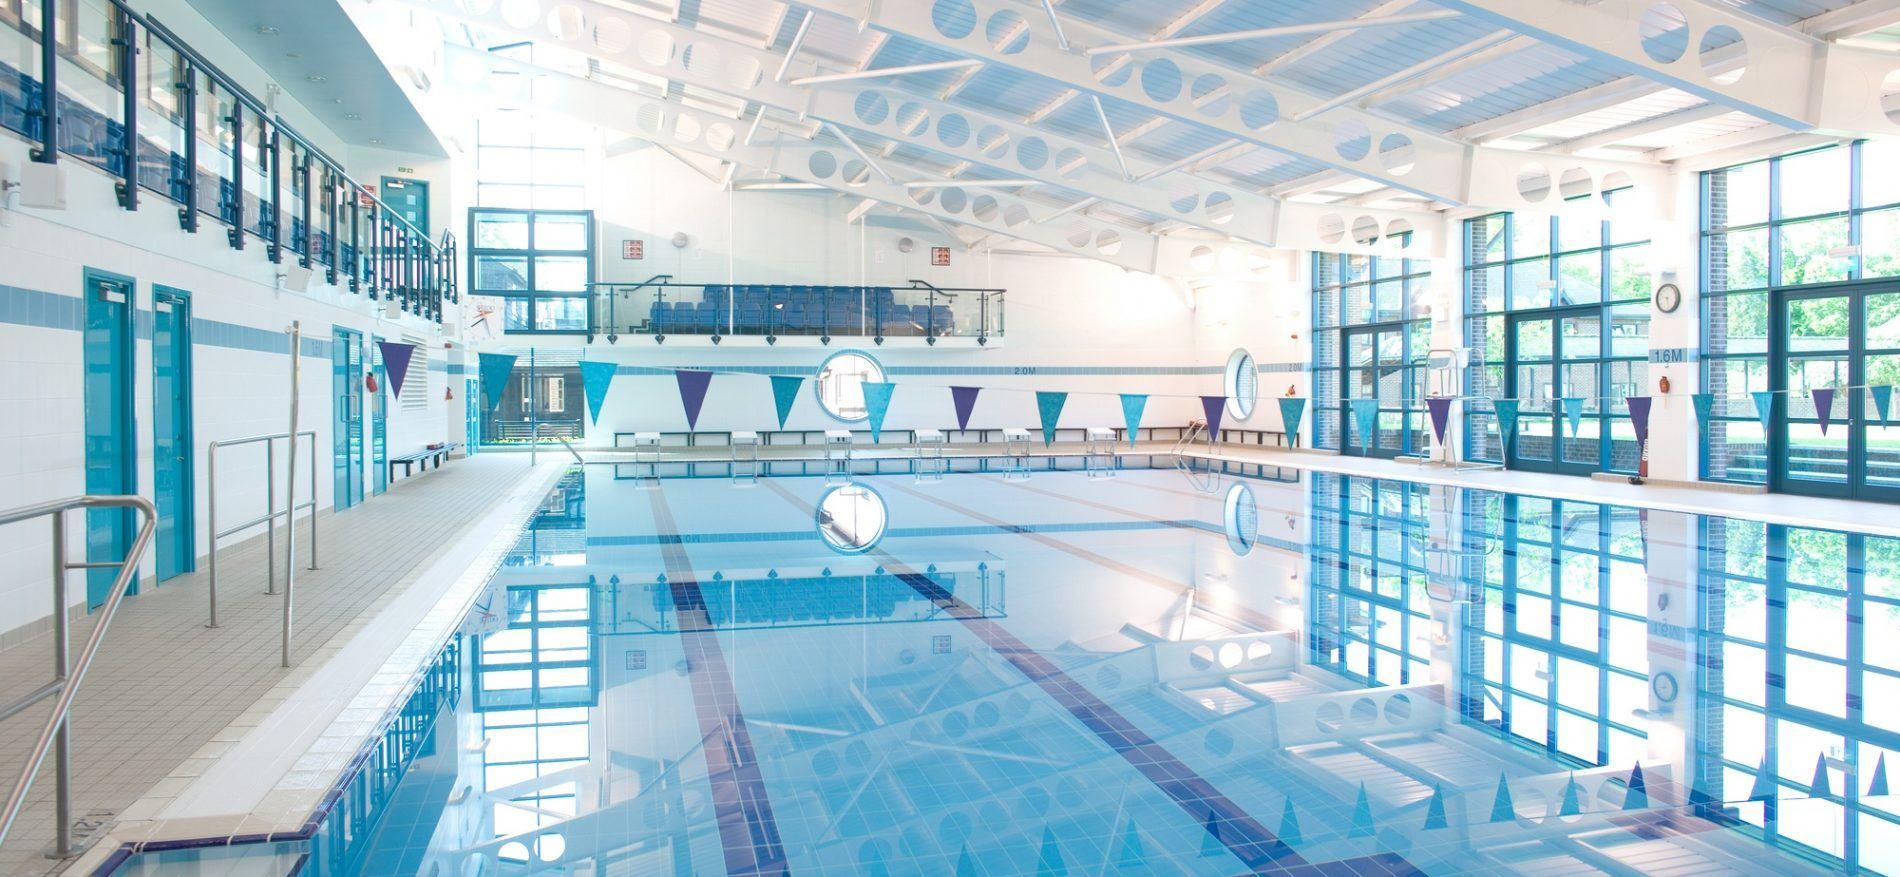 school swimming pool